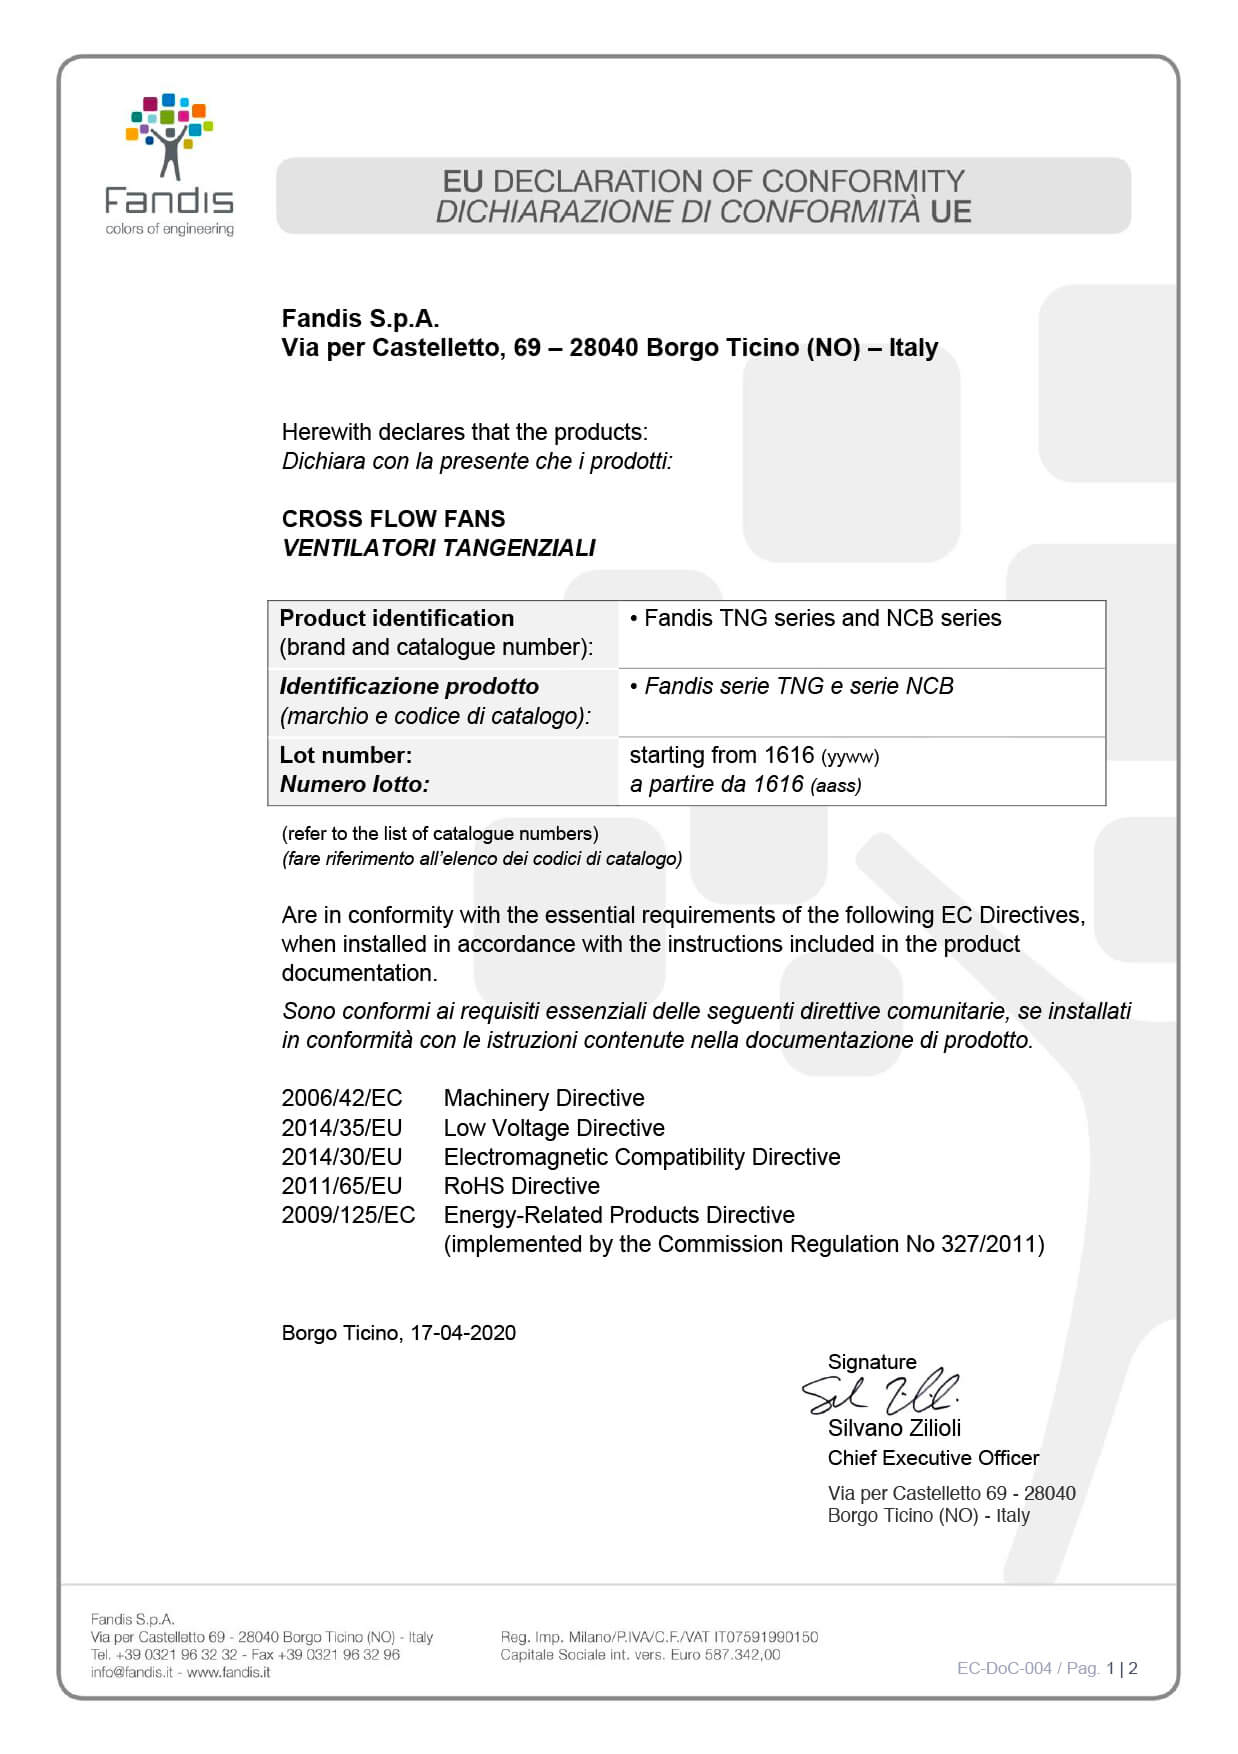 EC DoC 004 ventilatori tangenziali